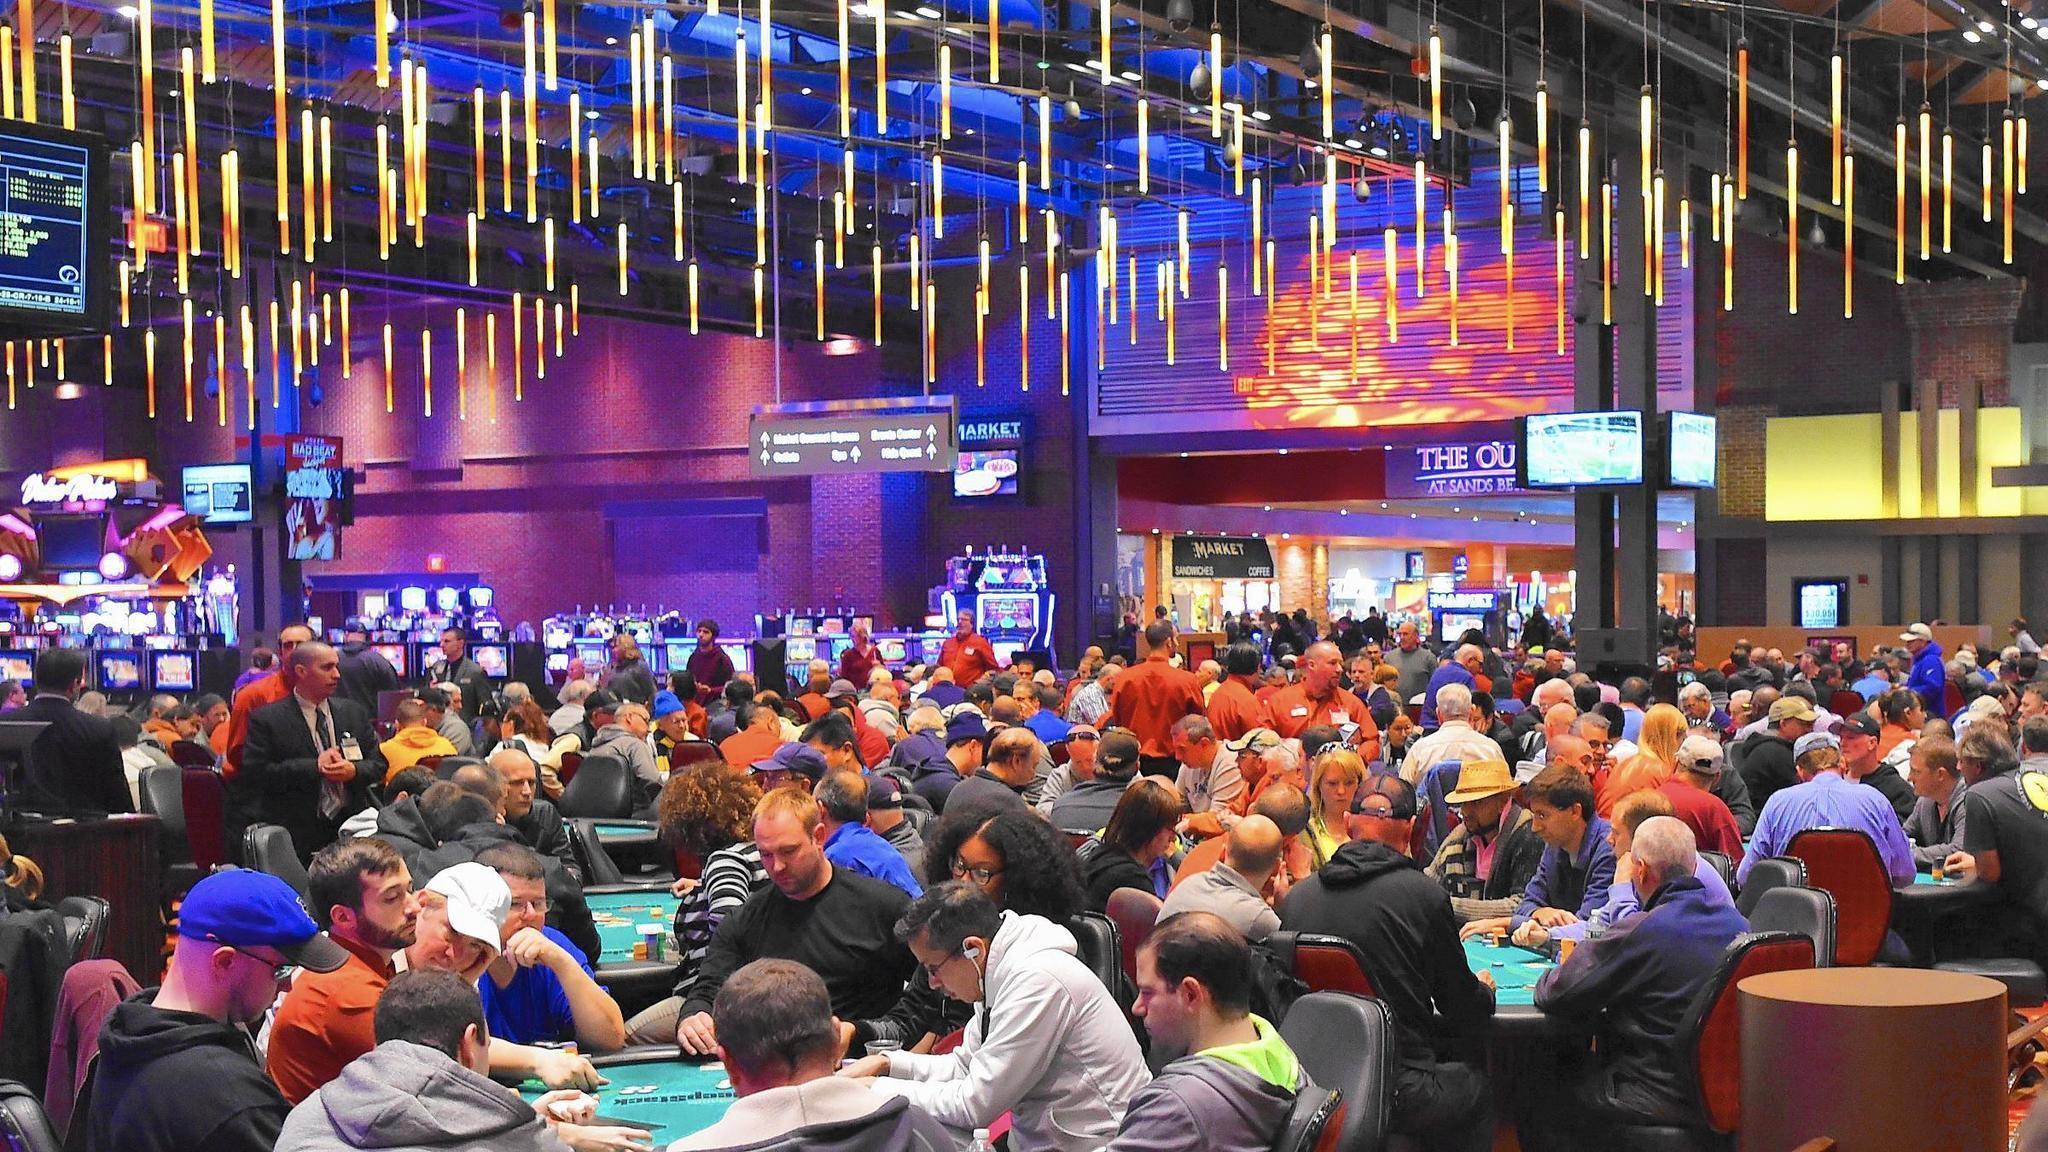 Sands casino penn casino com directory gambling game